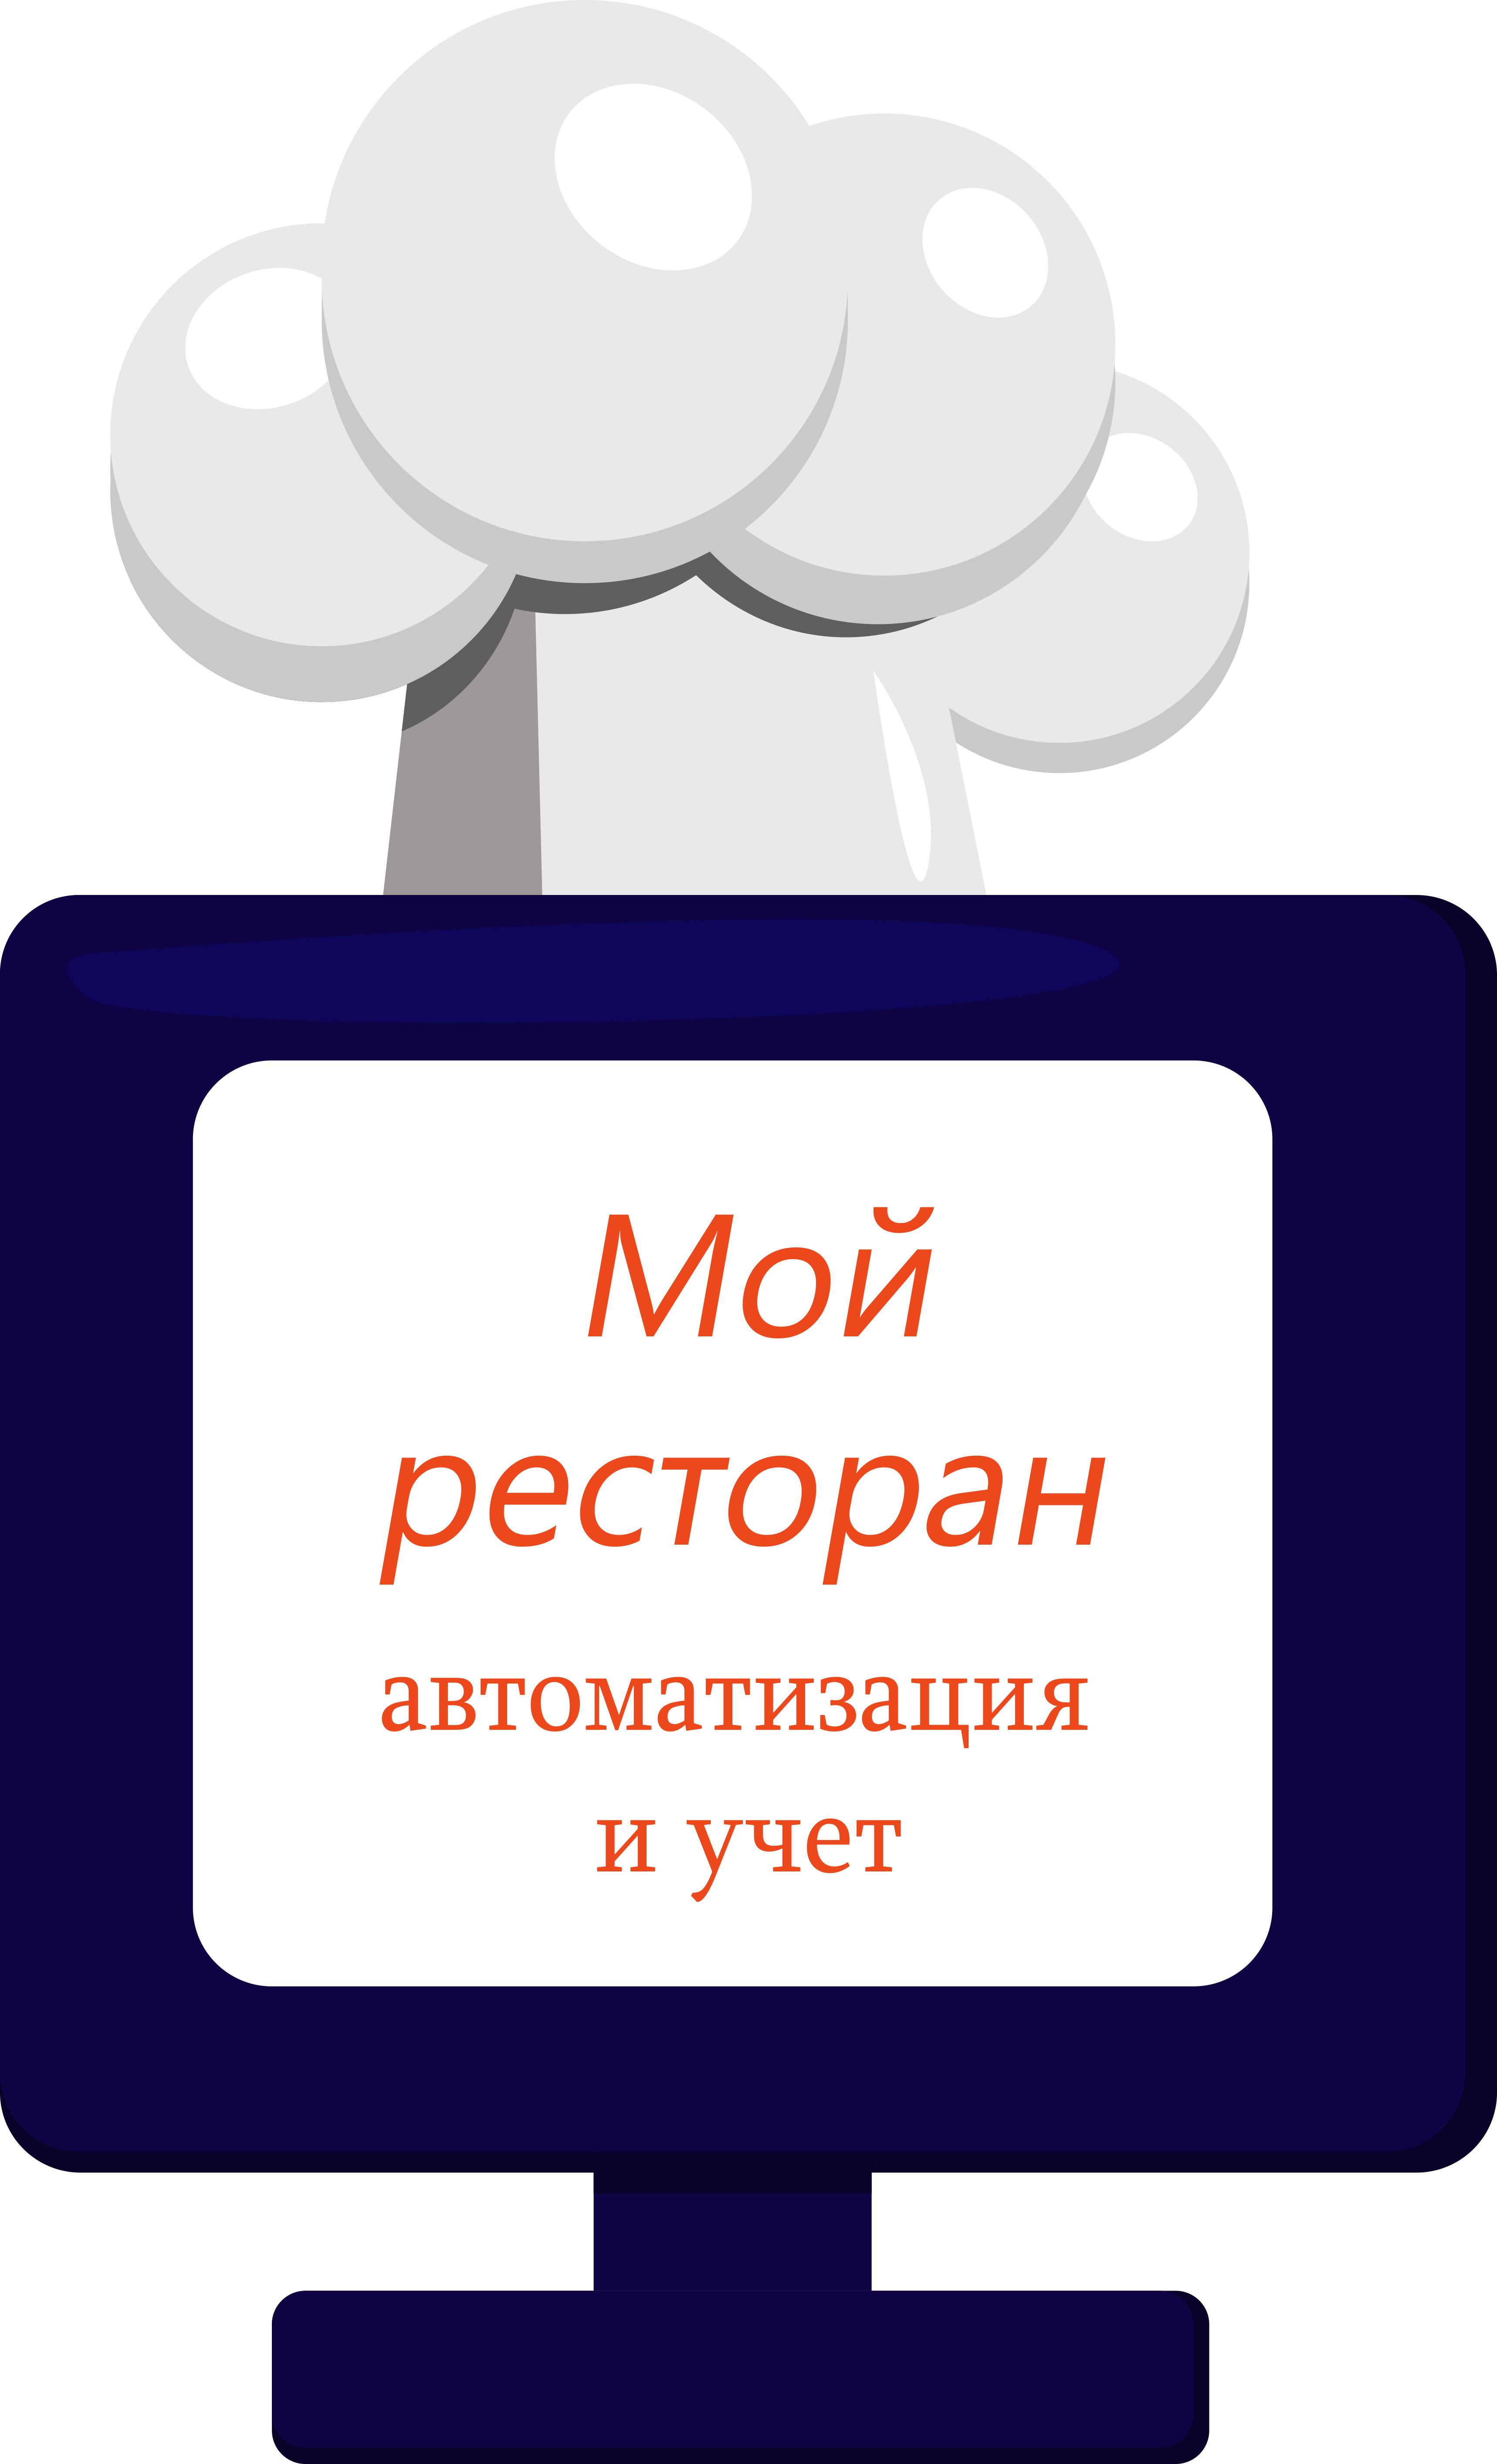 Разработать логотип и фавикон для IT- компании фото f_4375d5413d704641.jpg